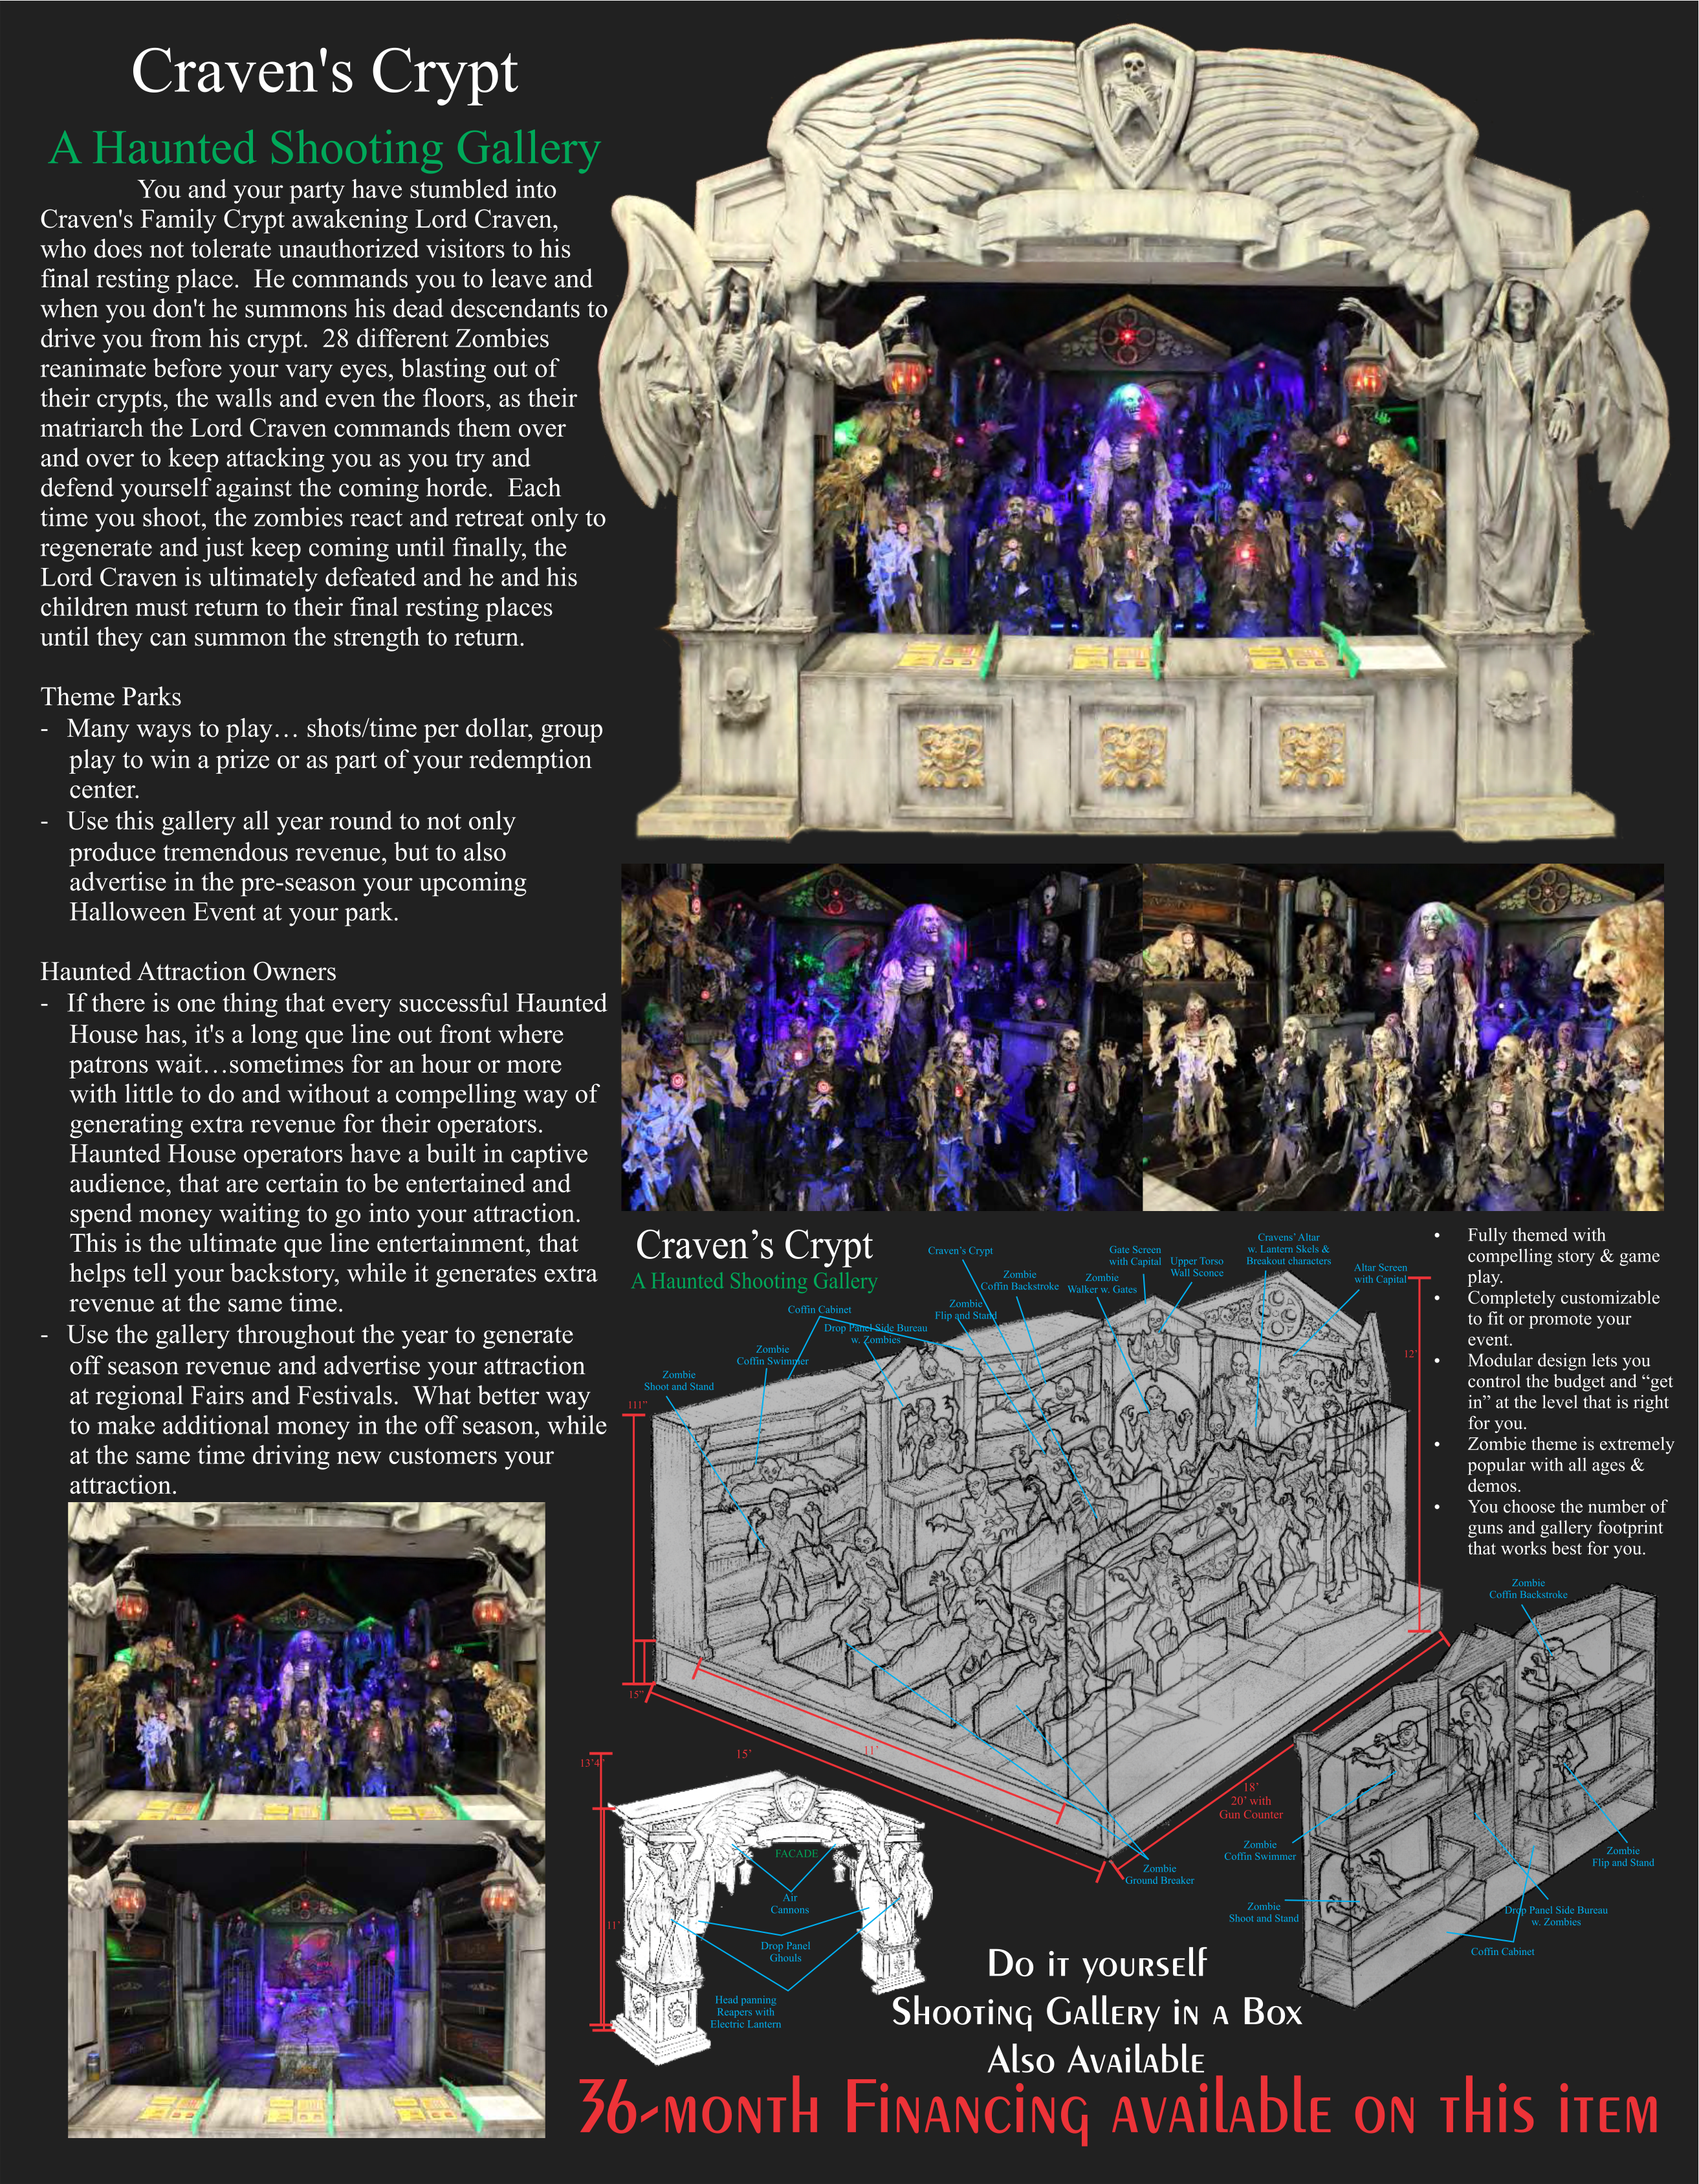 Cravens-Crypt